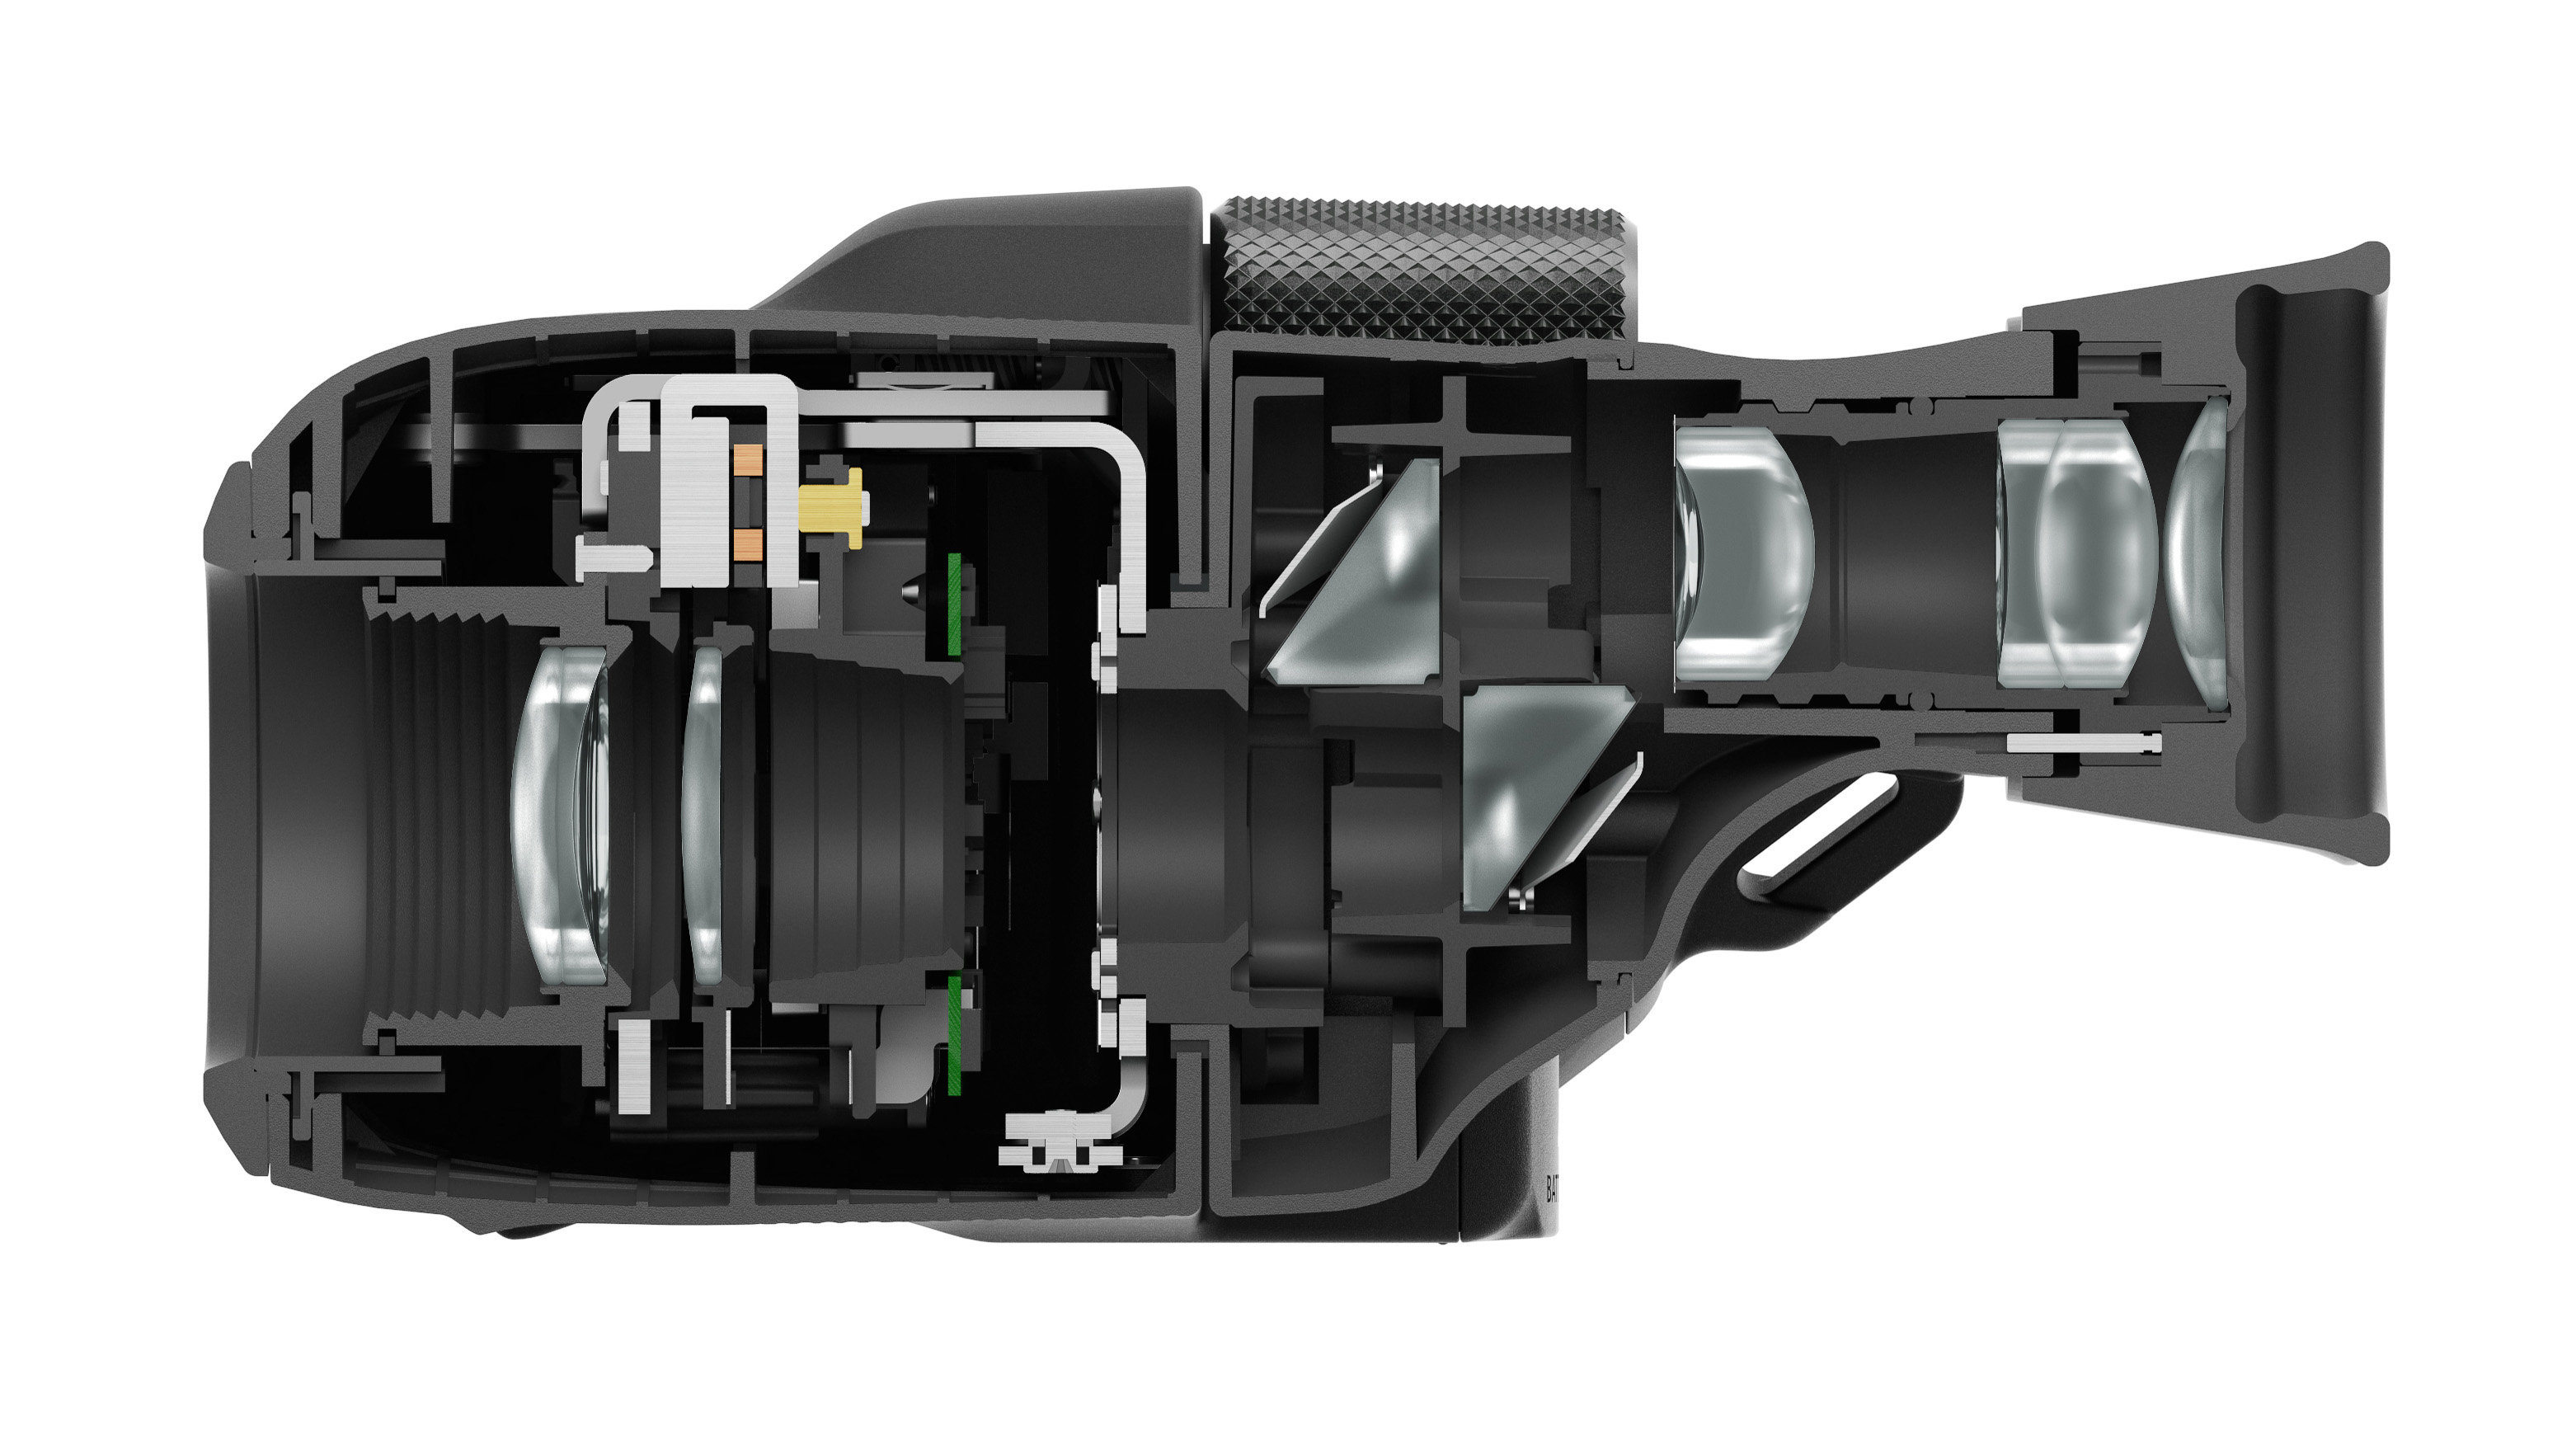 Canon 8x20 IS are world's lightest image stabilized binoculars   Digital Camera World